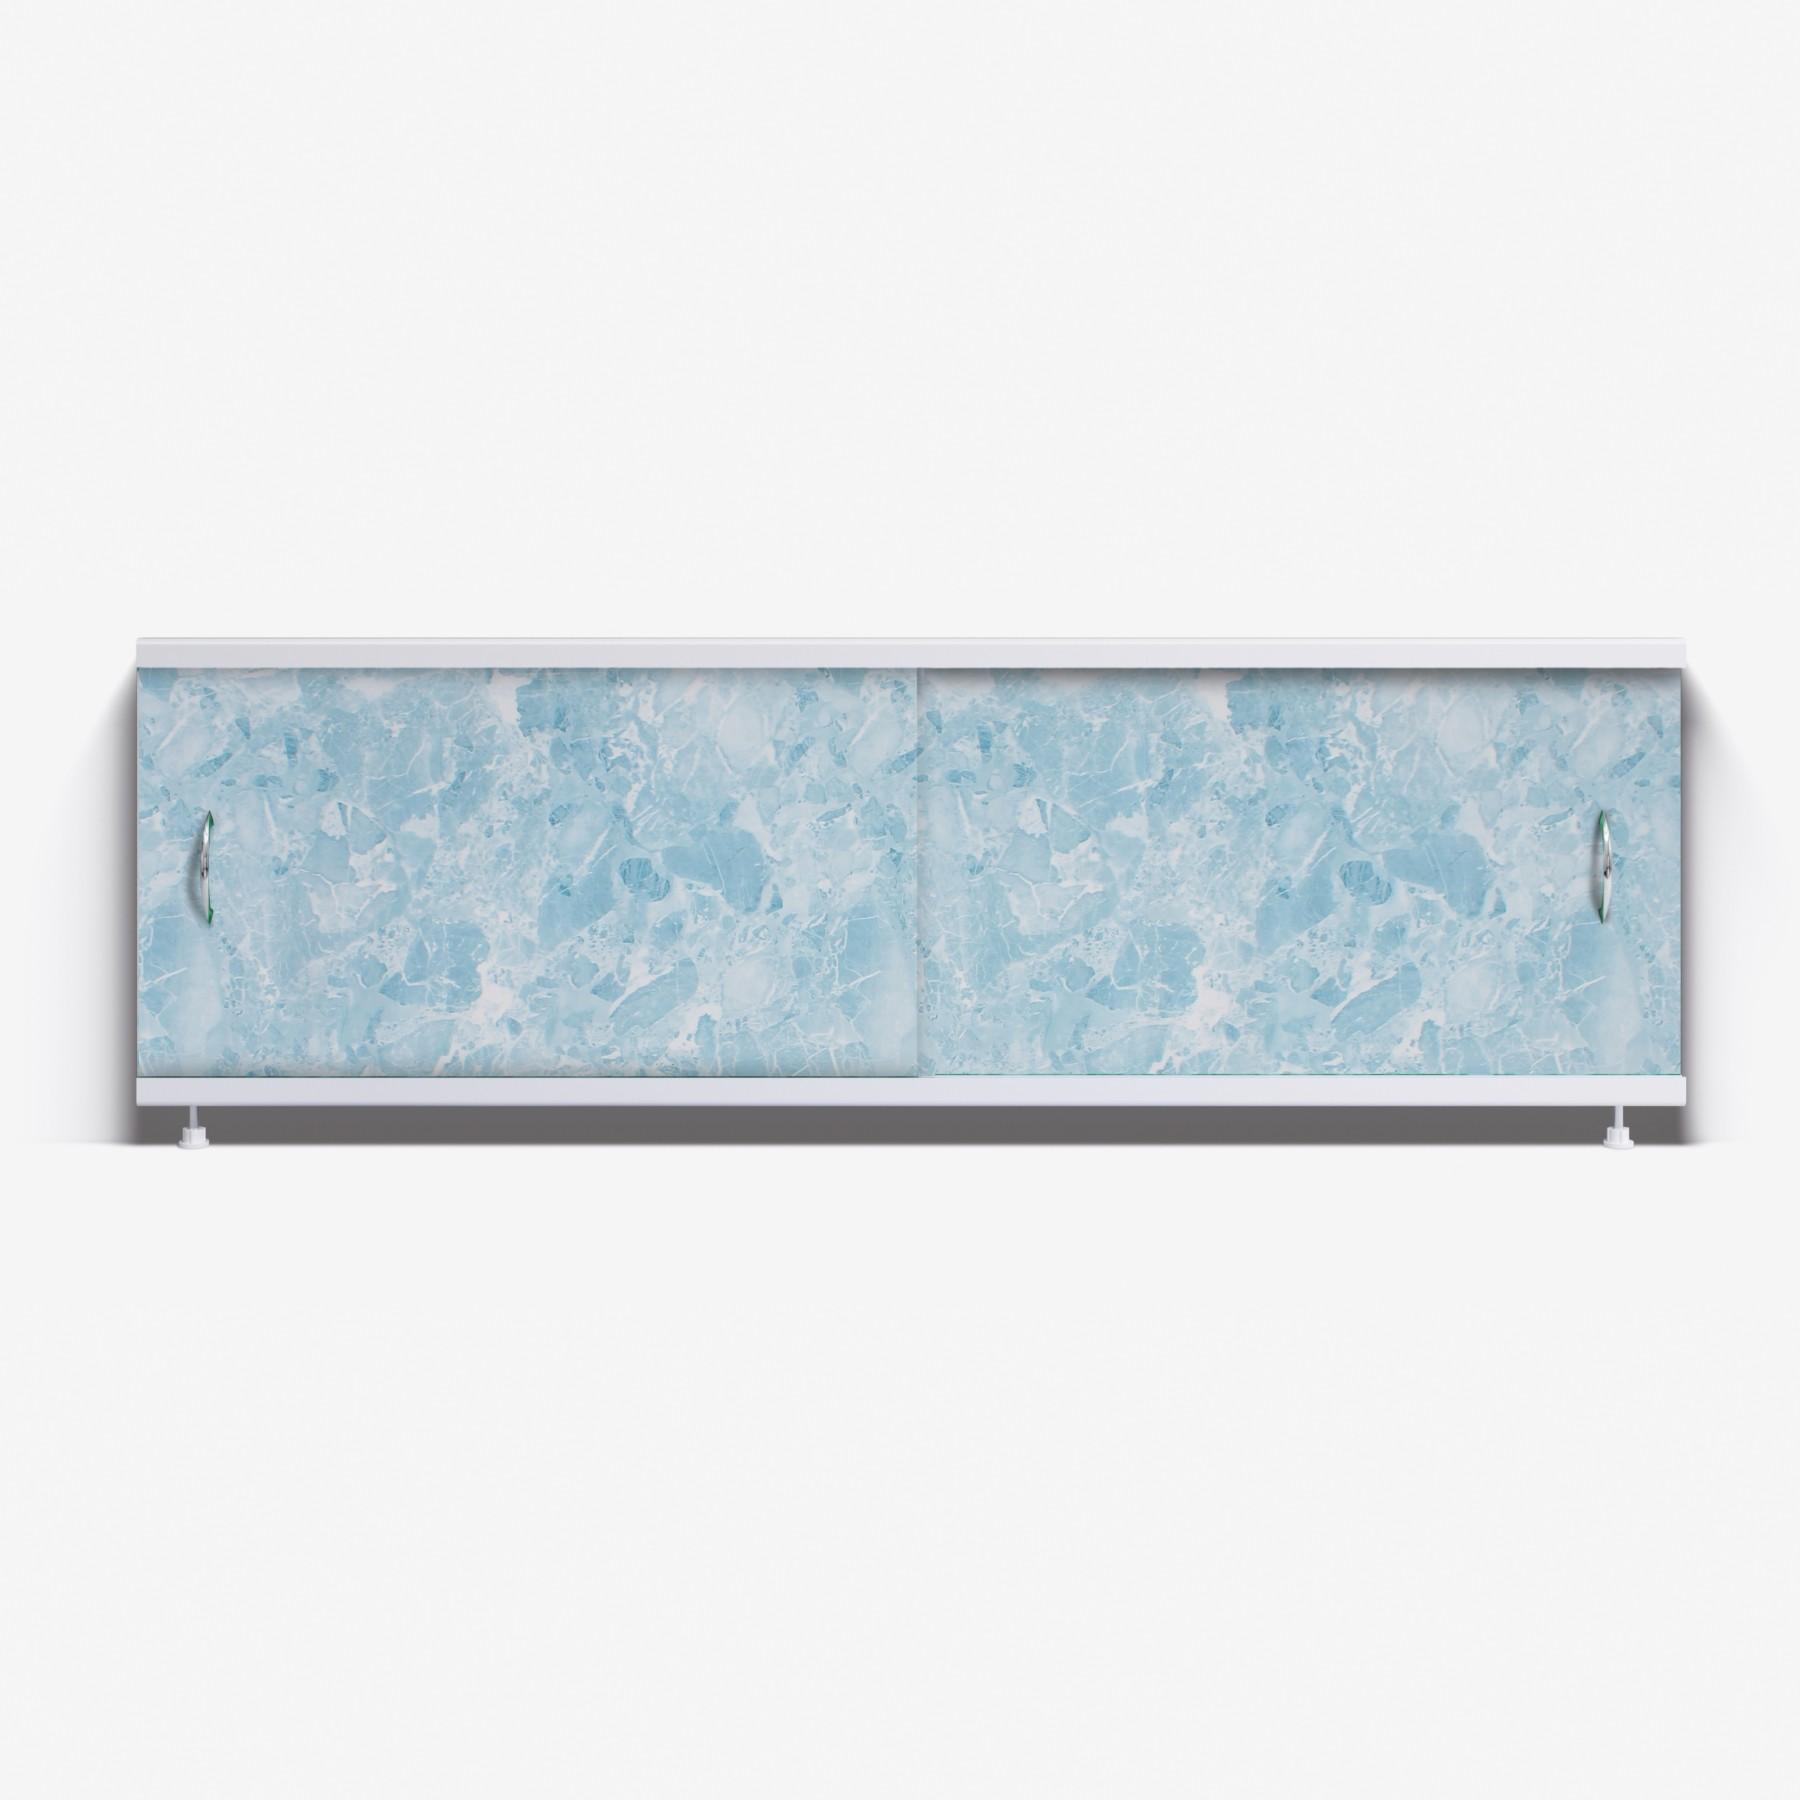 Экран под ванну Классик 150 светло-синий мрамор